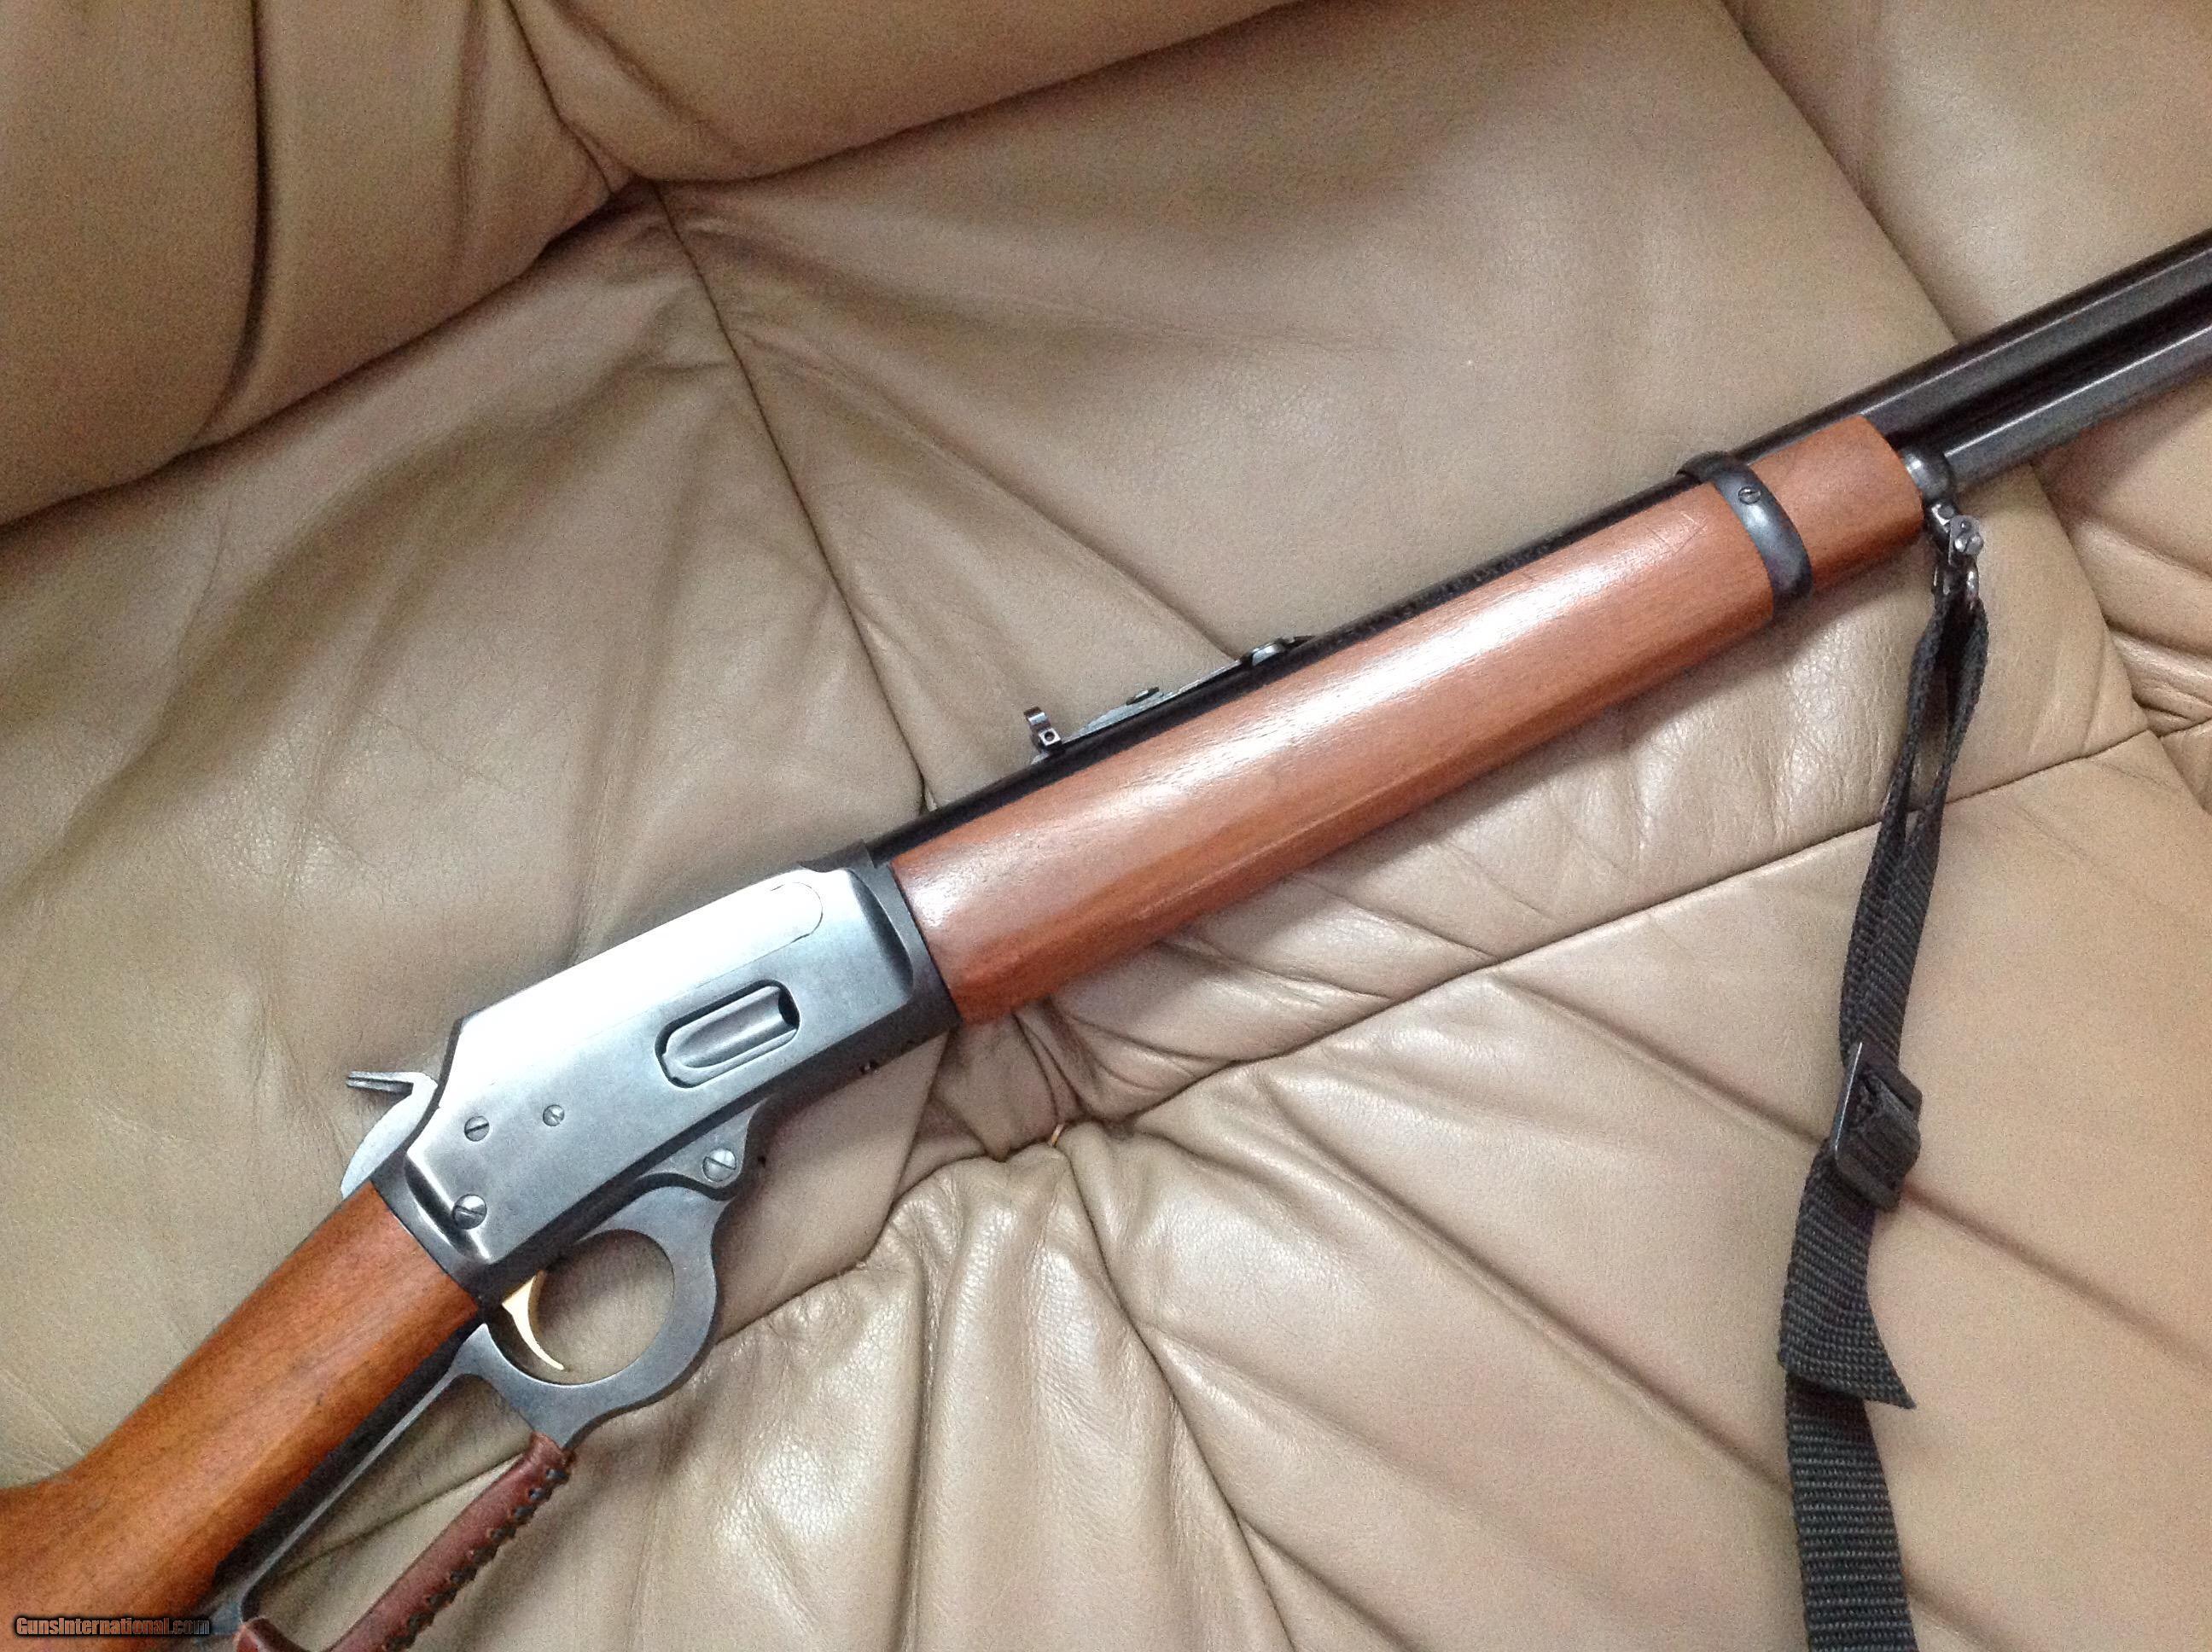 Marlin Model 94 357 Magnum Diagram Wiring Will Be A Thing 1894 Parts Carbine 18 1 2 Trapper Micro Groove Rh Gunsinternational Com